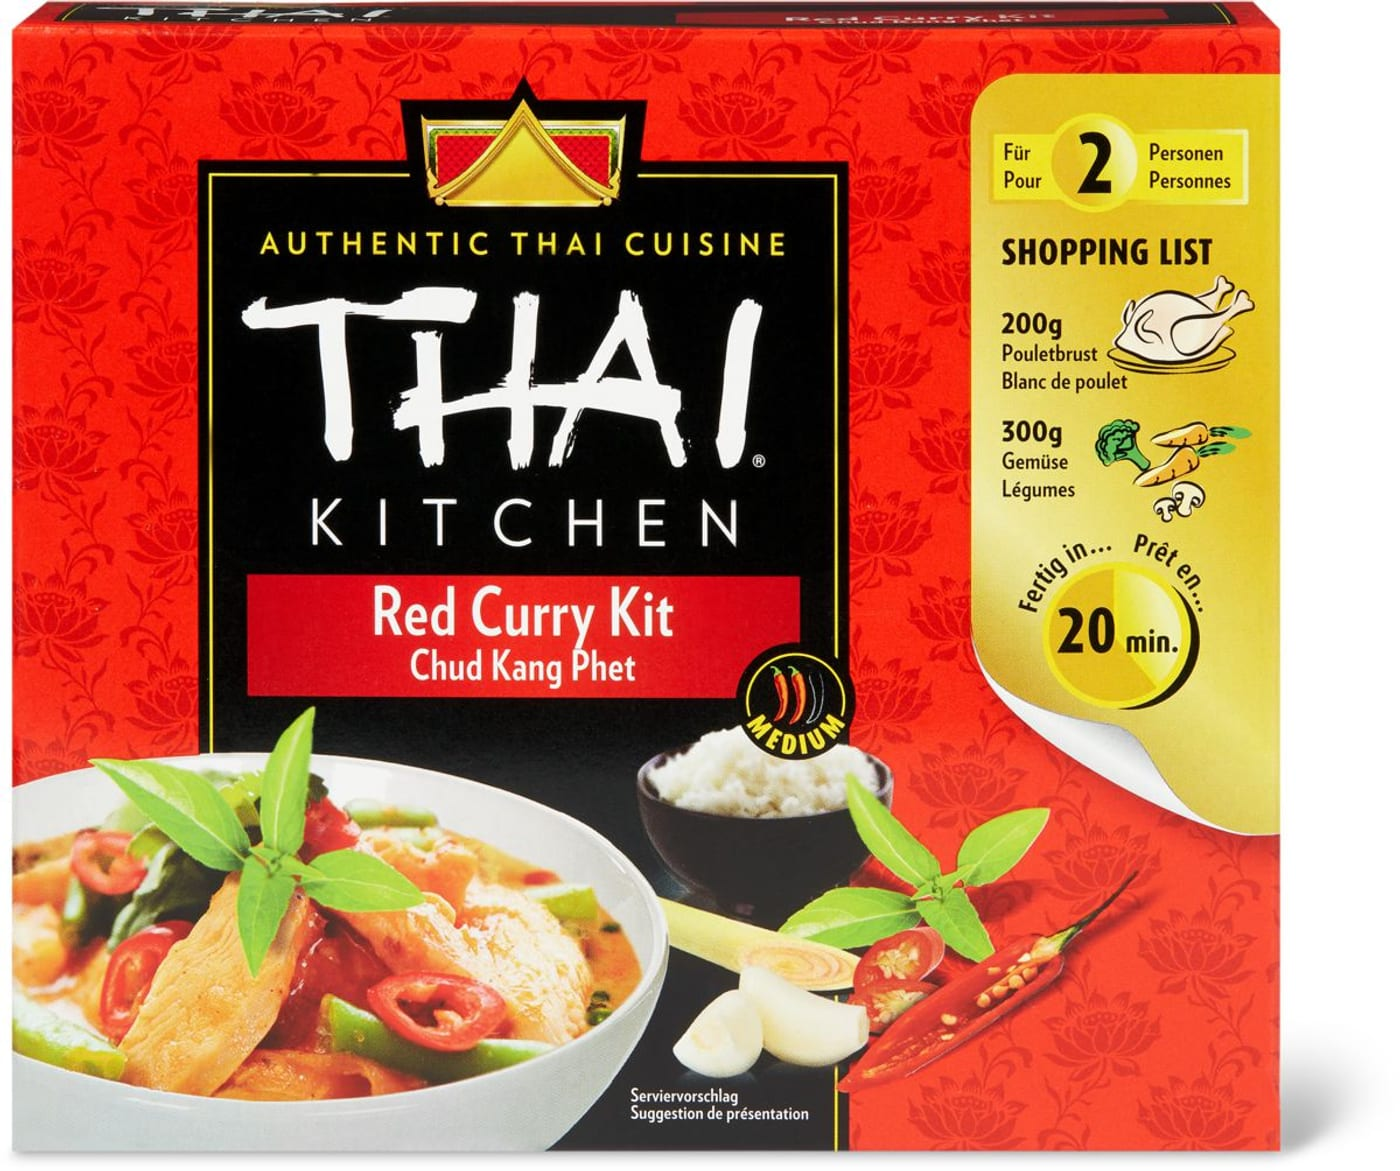 Thai Kitchen 2: Thai Kitchen Red Curry Kit